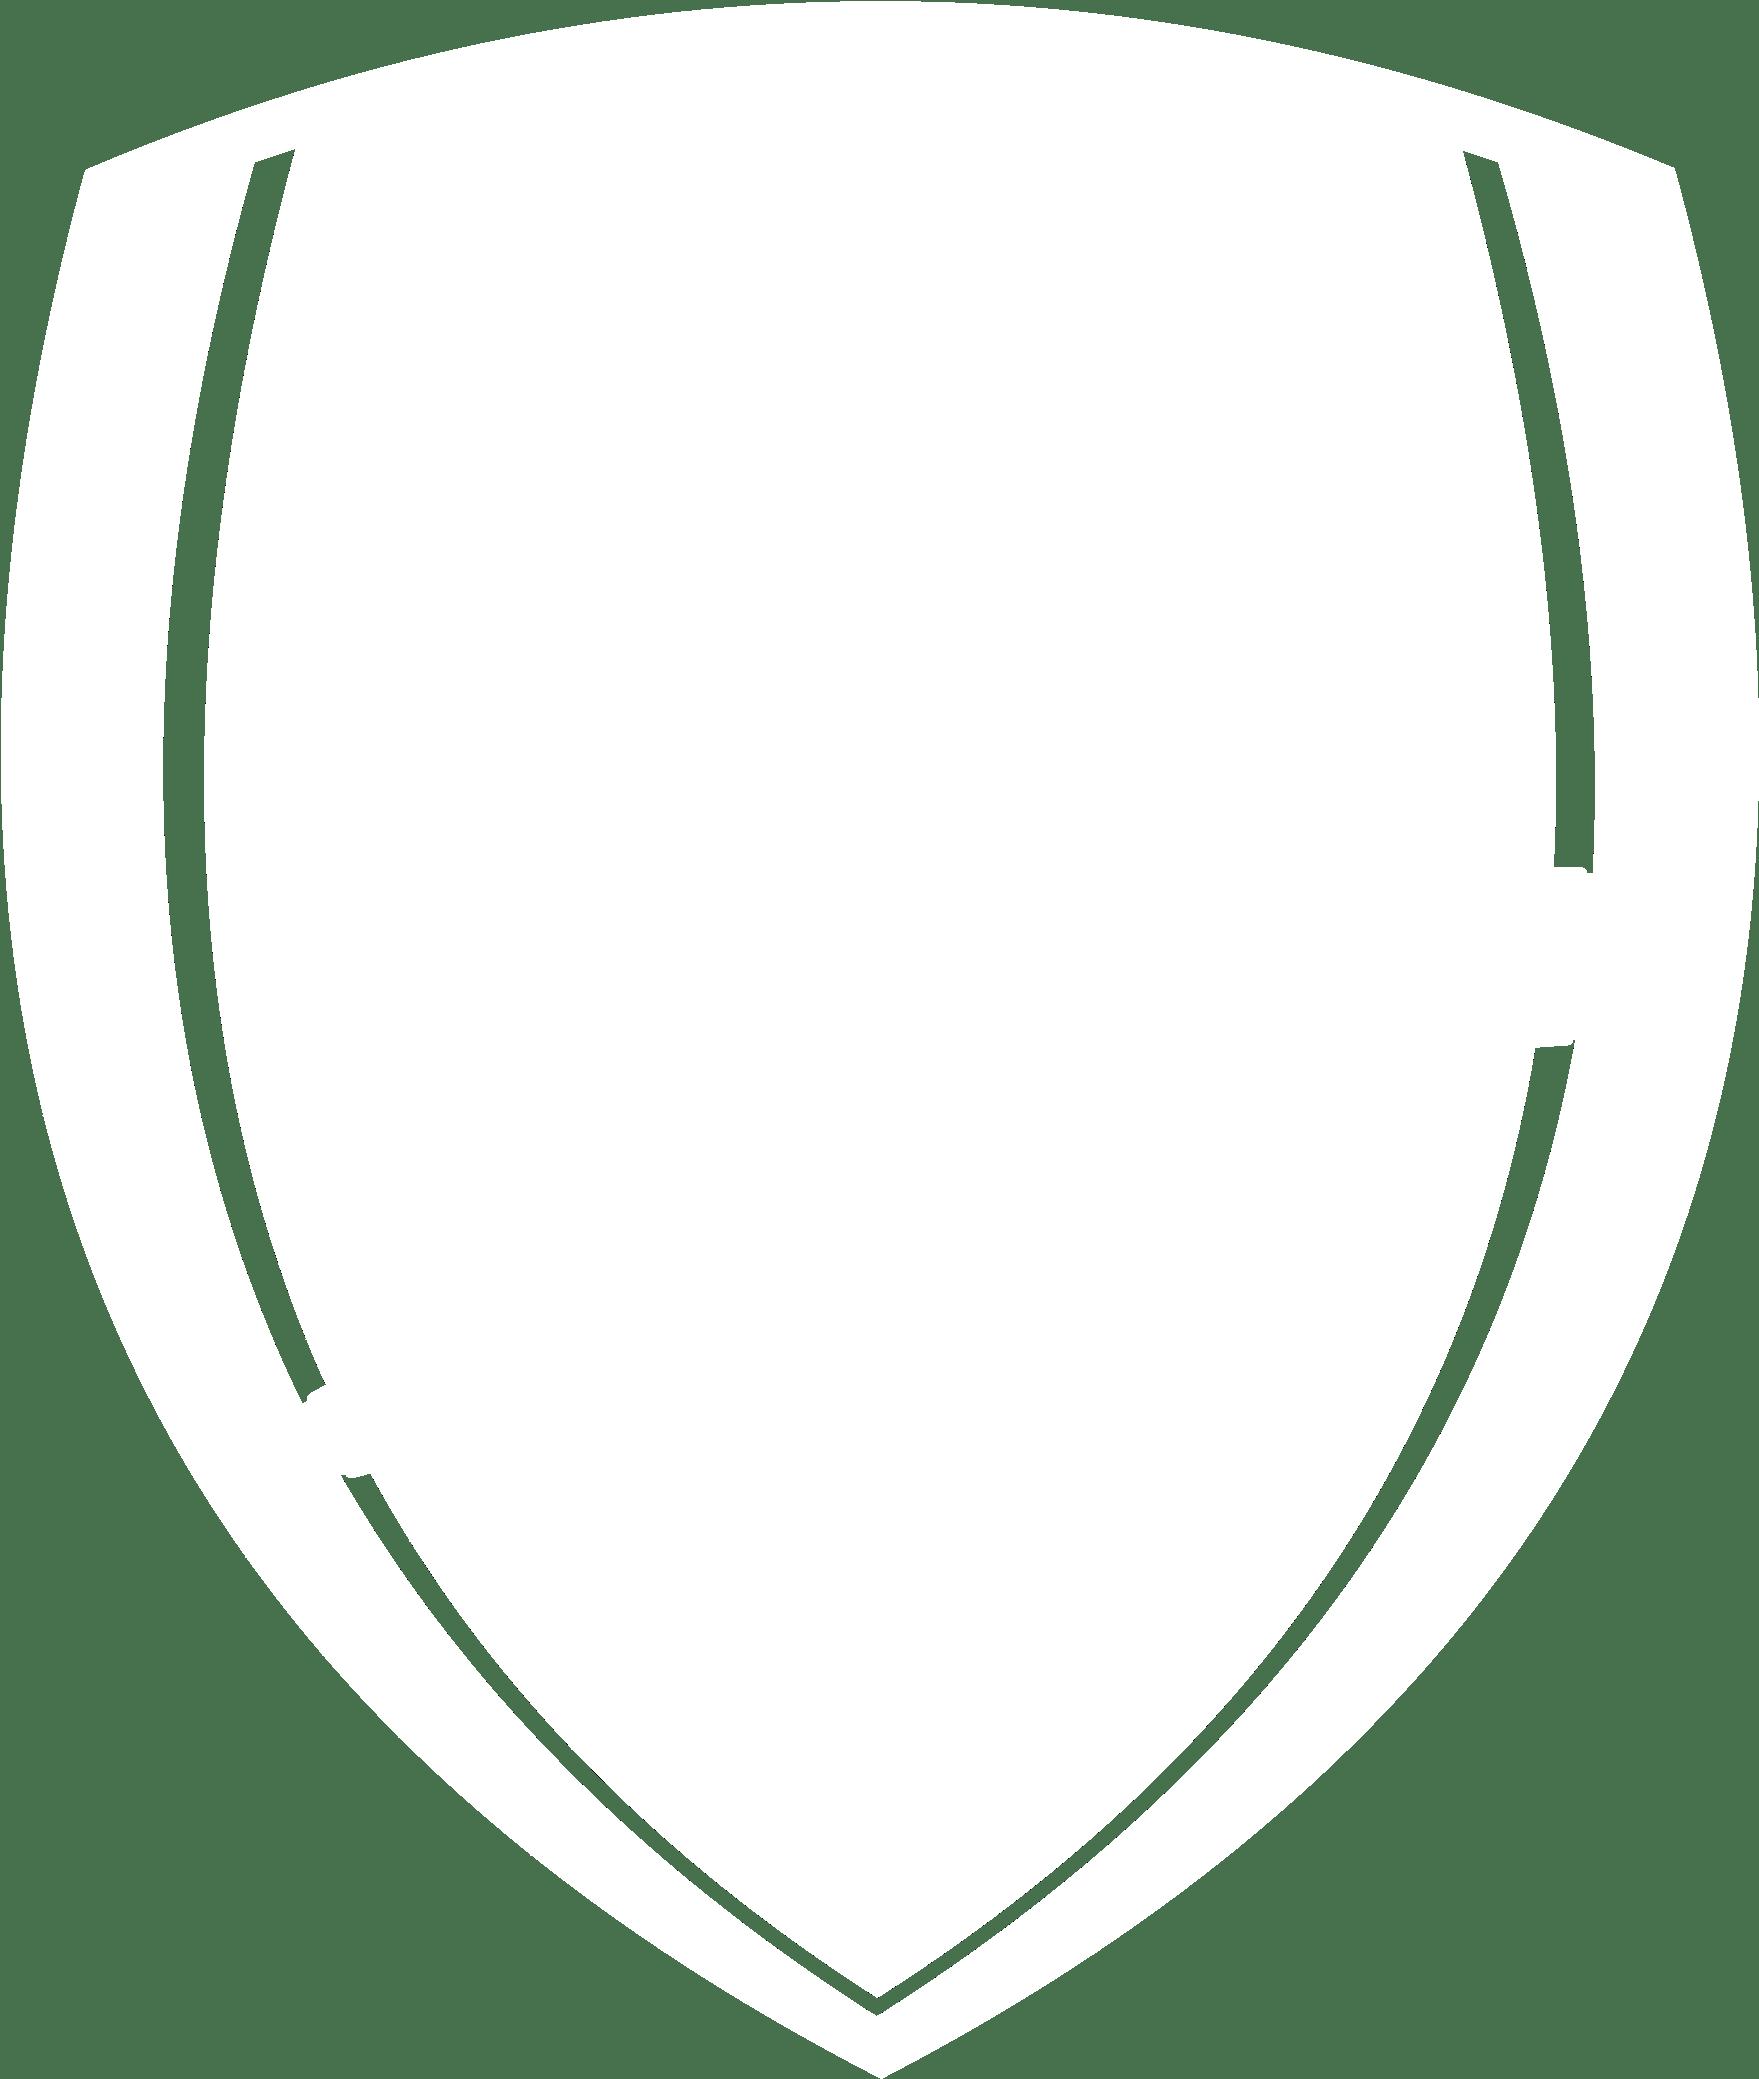 download arsenal logo black and white